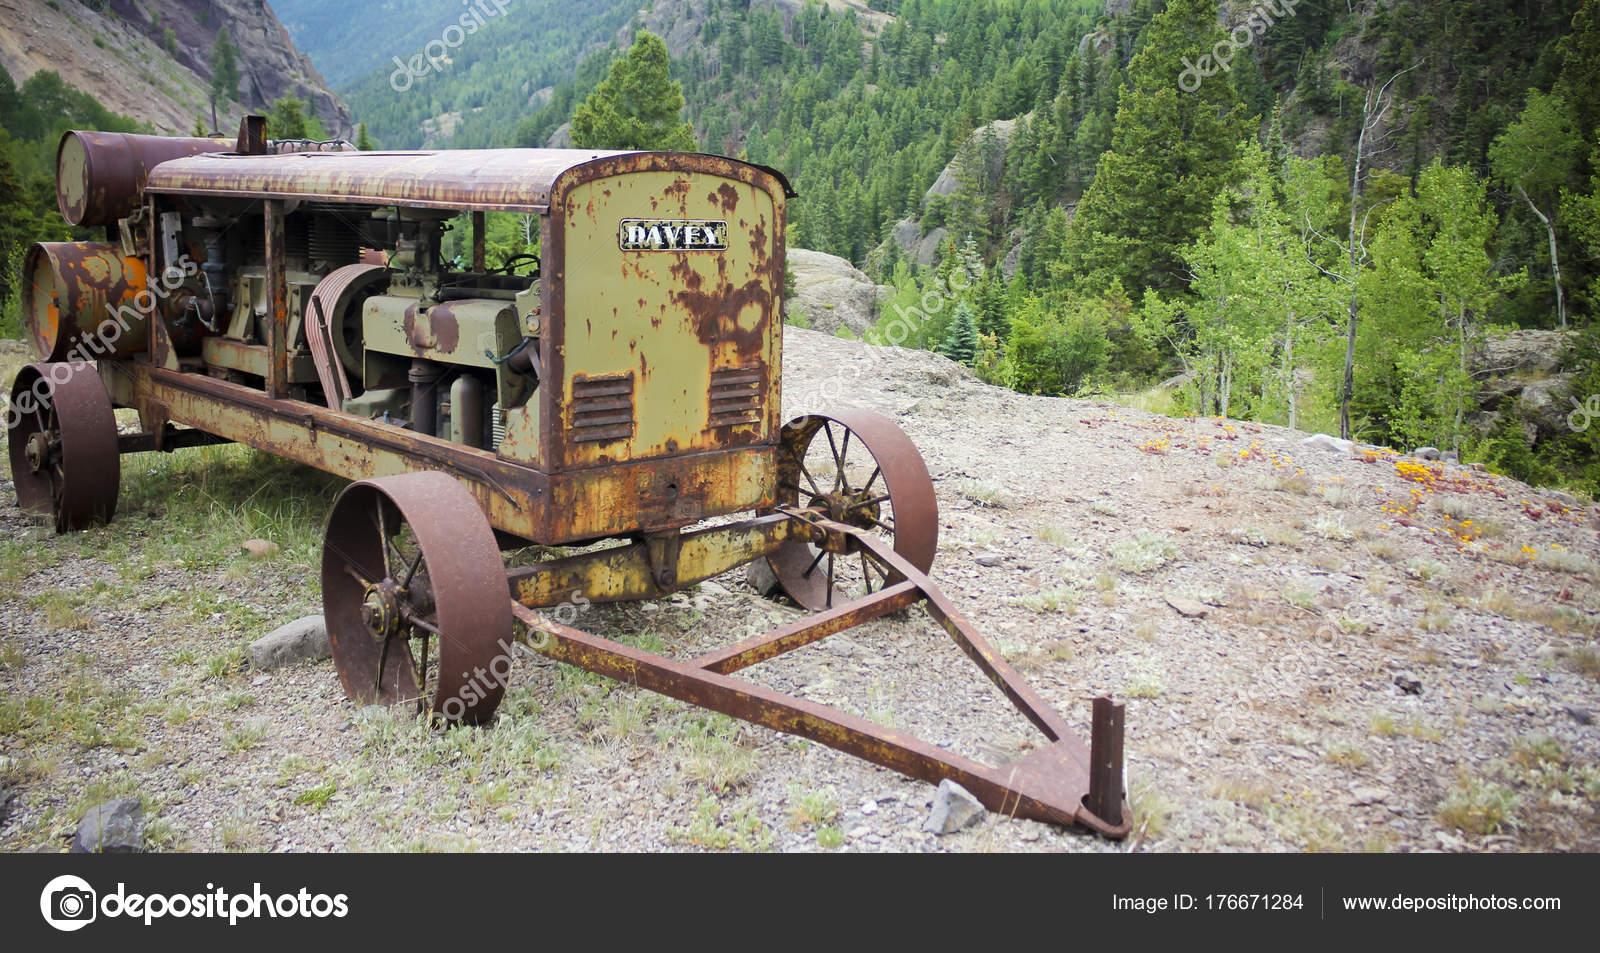 Antique Davey Generator, Ute Ulay Mine, Henson Ghost Town